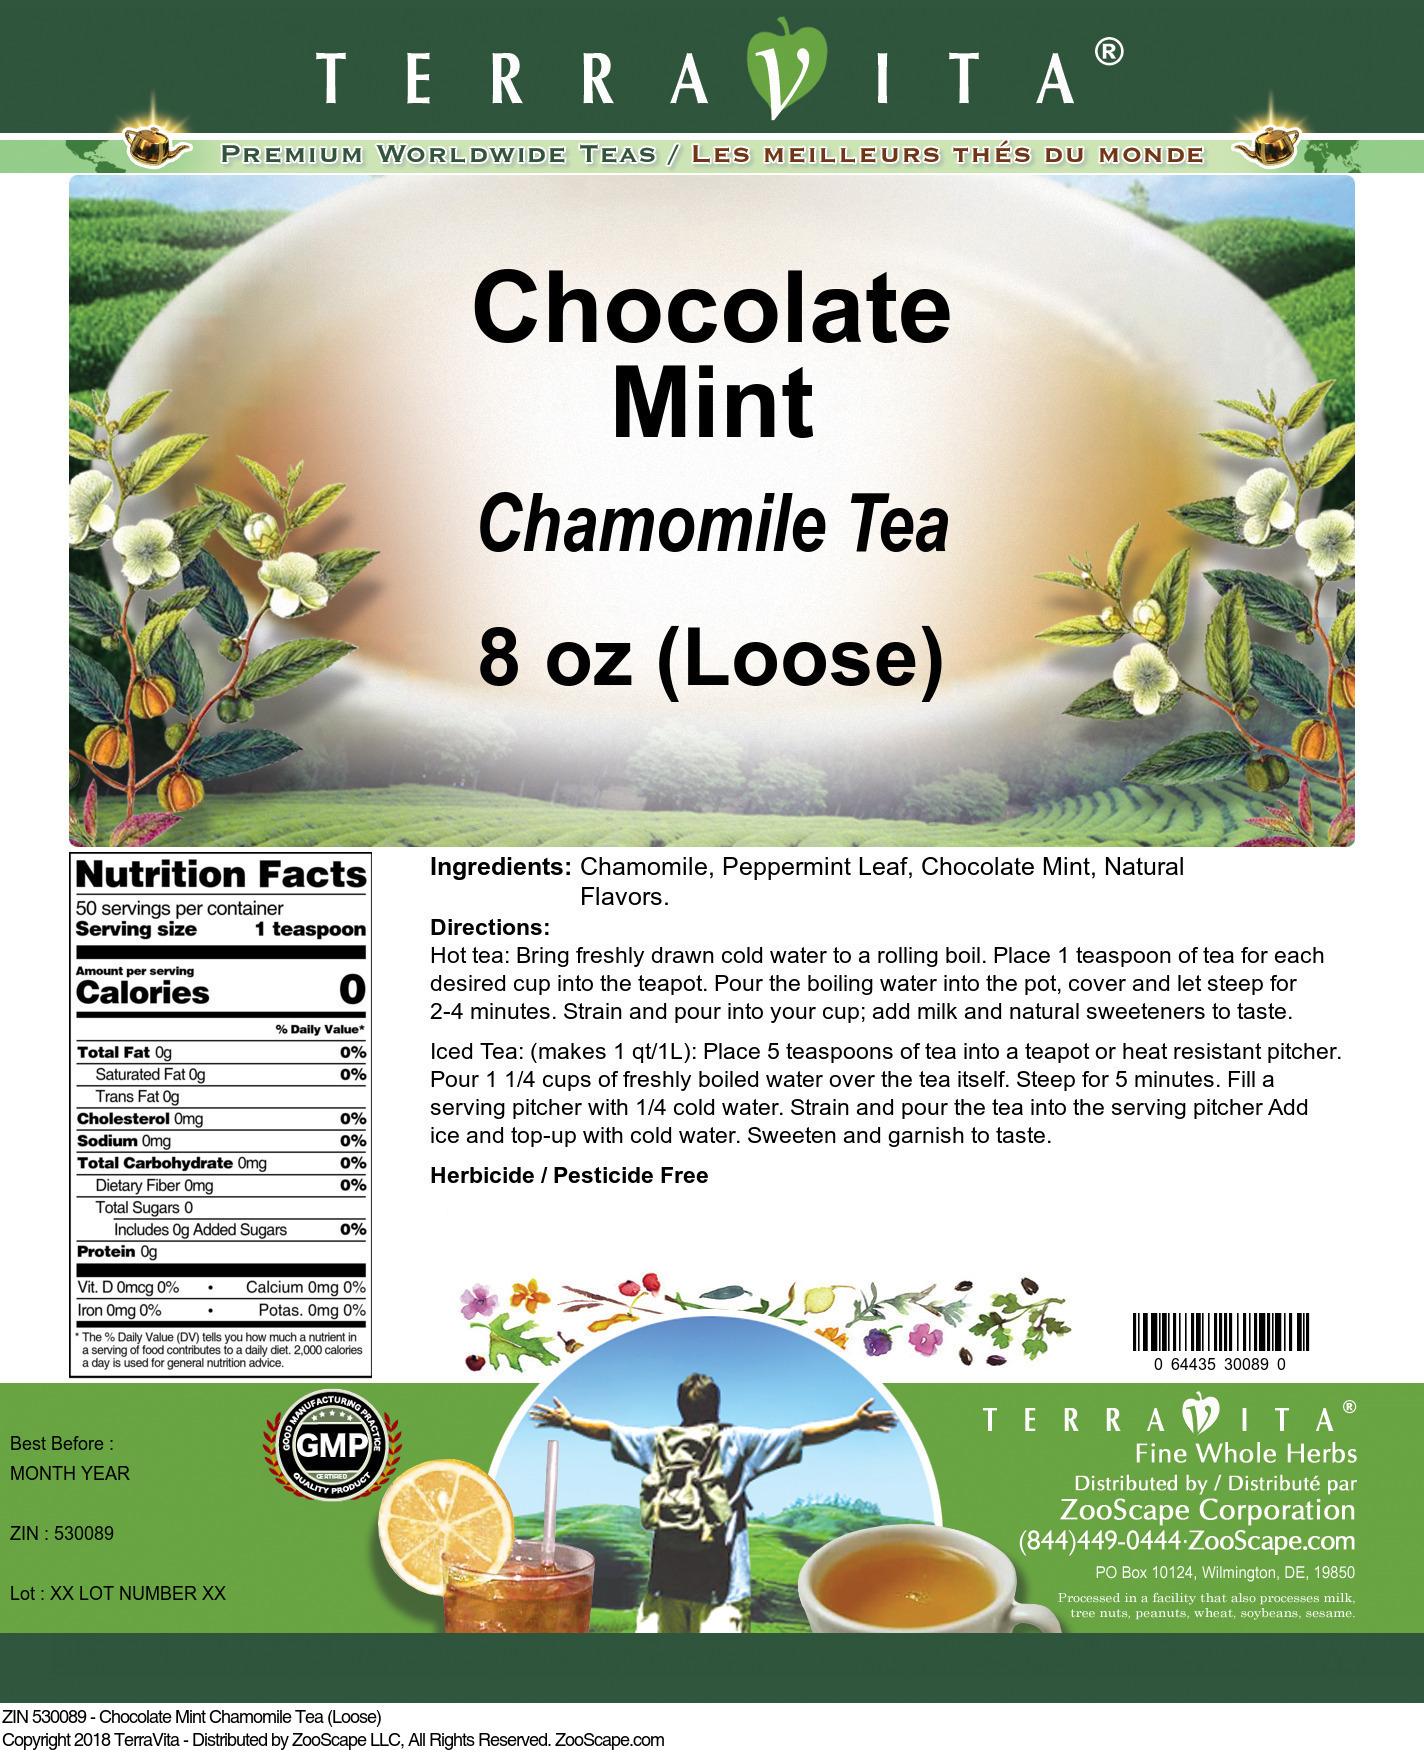 Chocolate Mint Chamomile Tea (Loose)